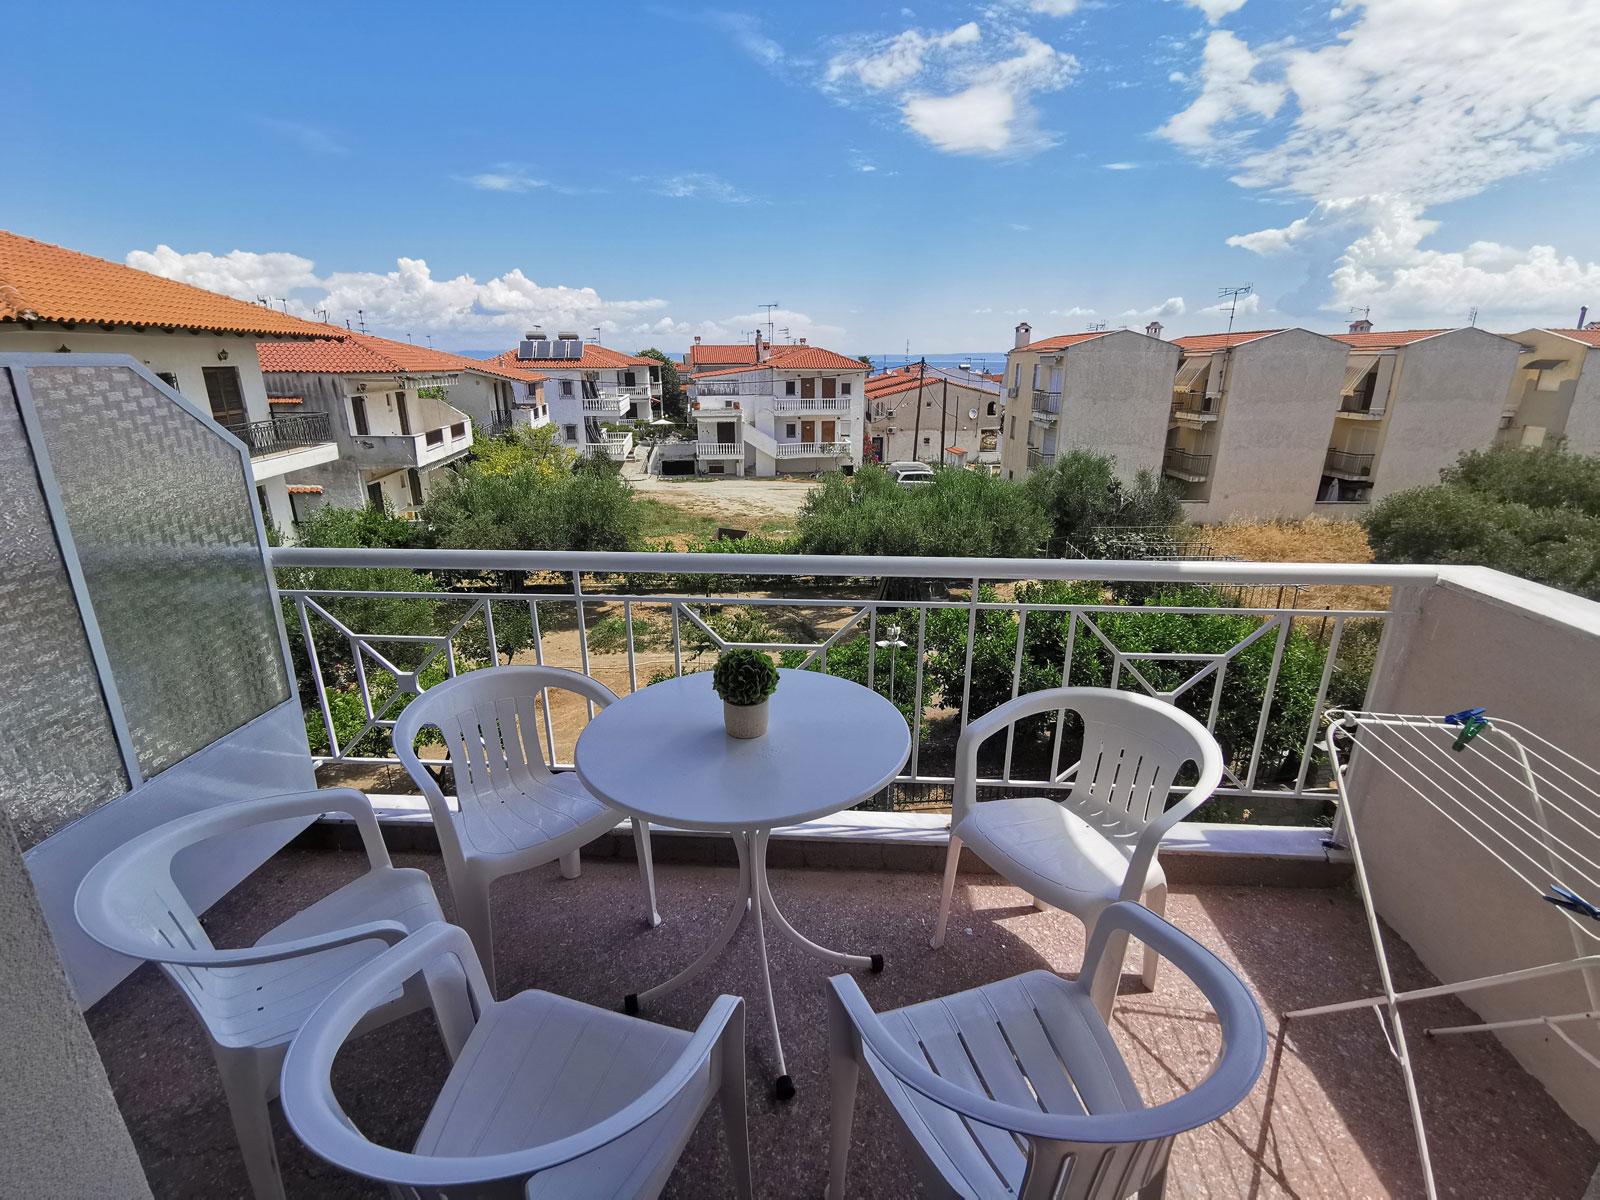 Grcka apartmani letovanje, Polihrono Halkidiki, Green Gardens, celika terasa